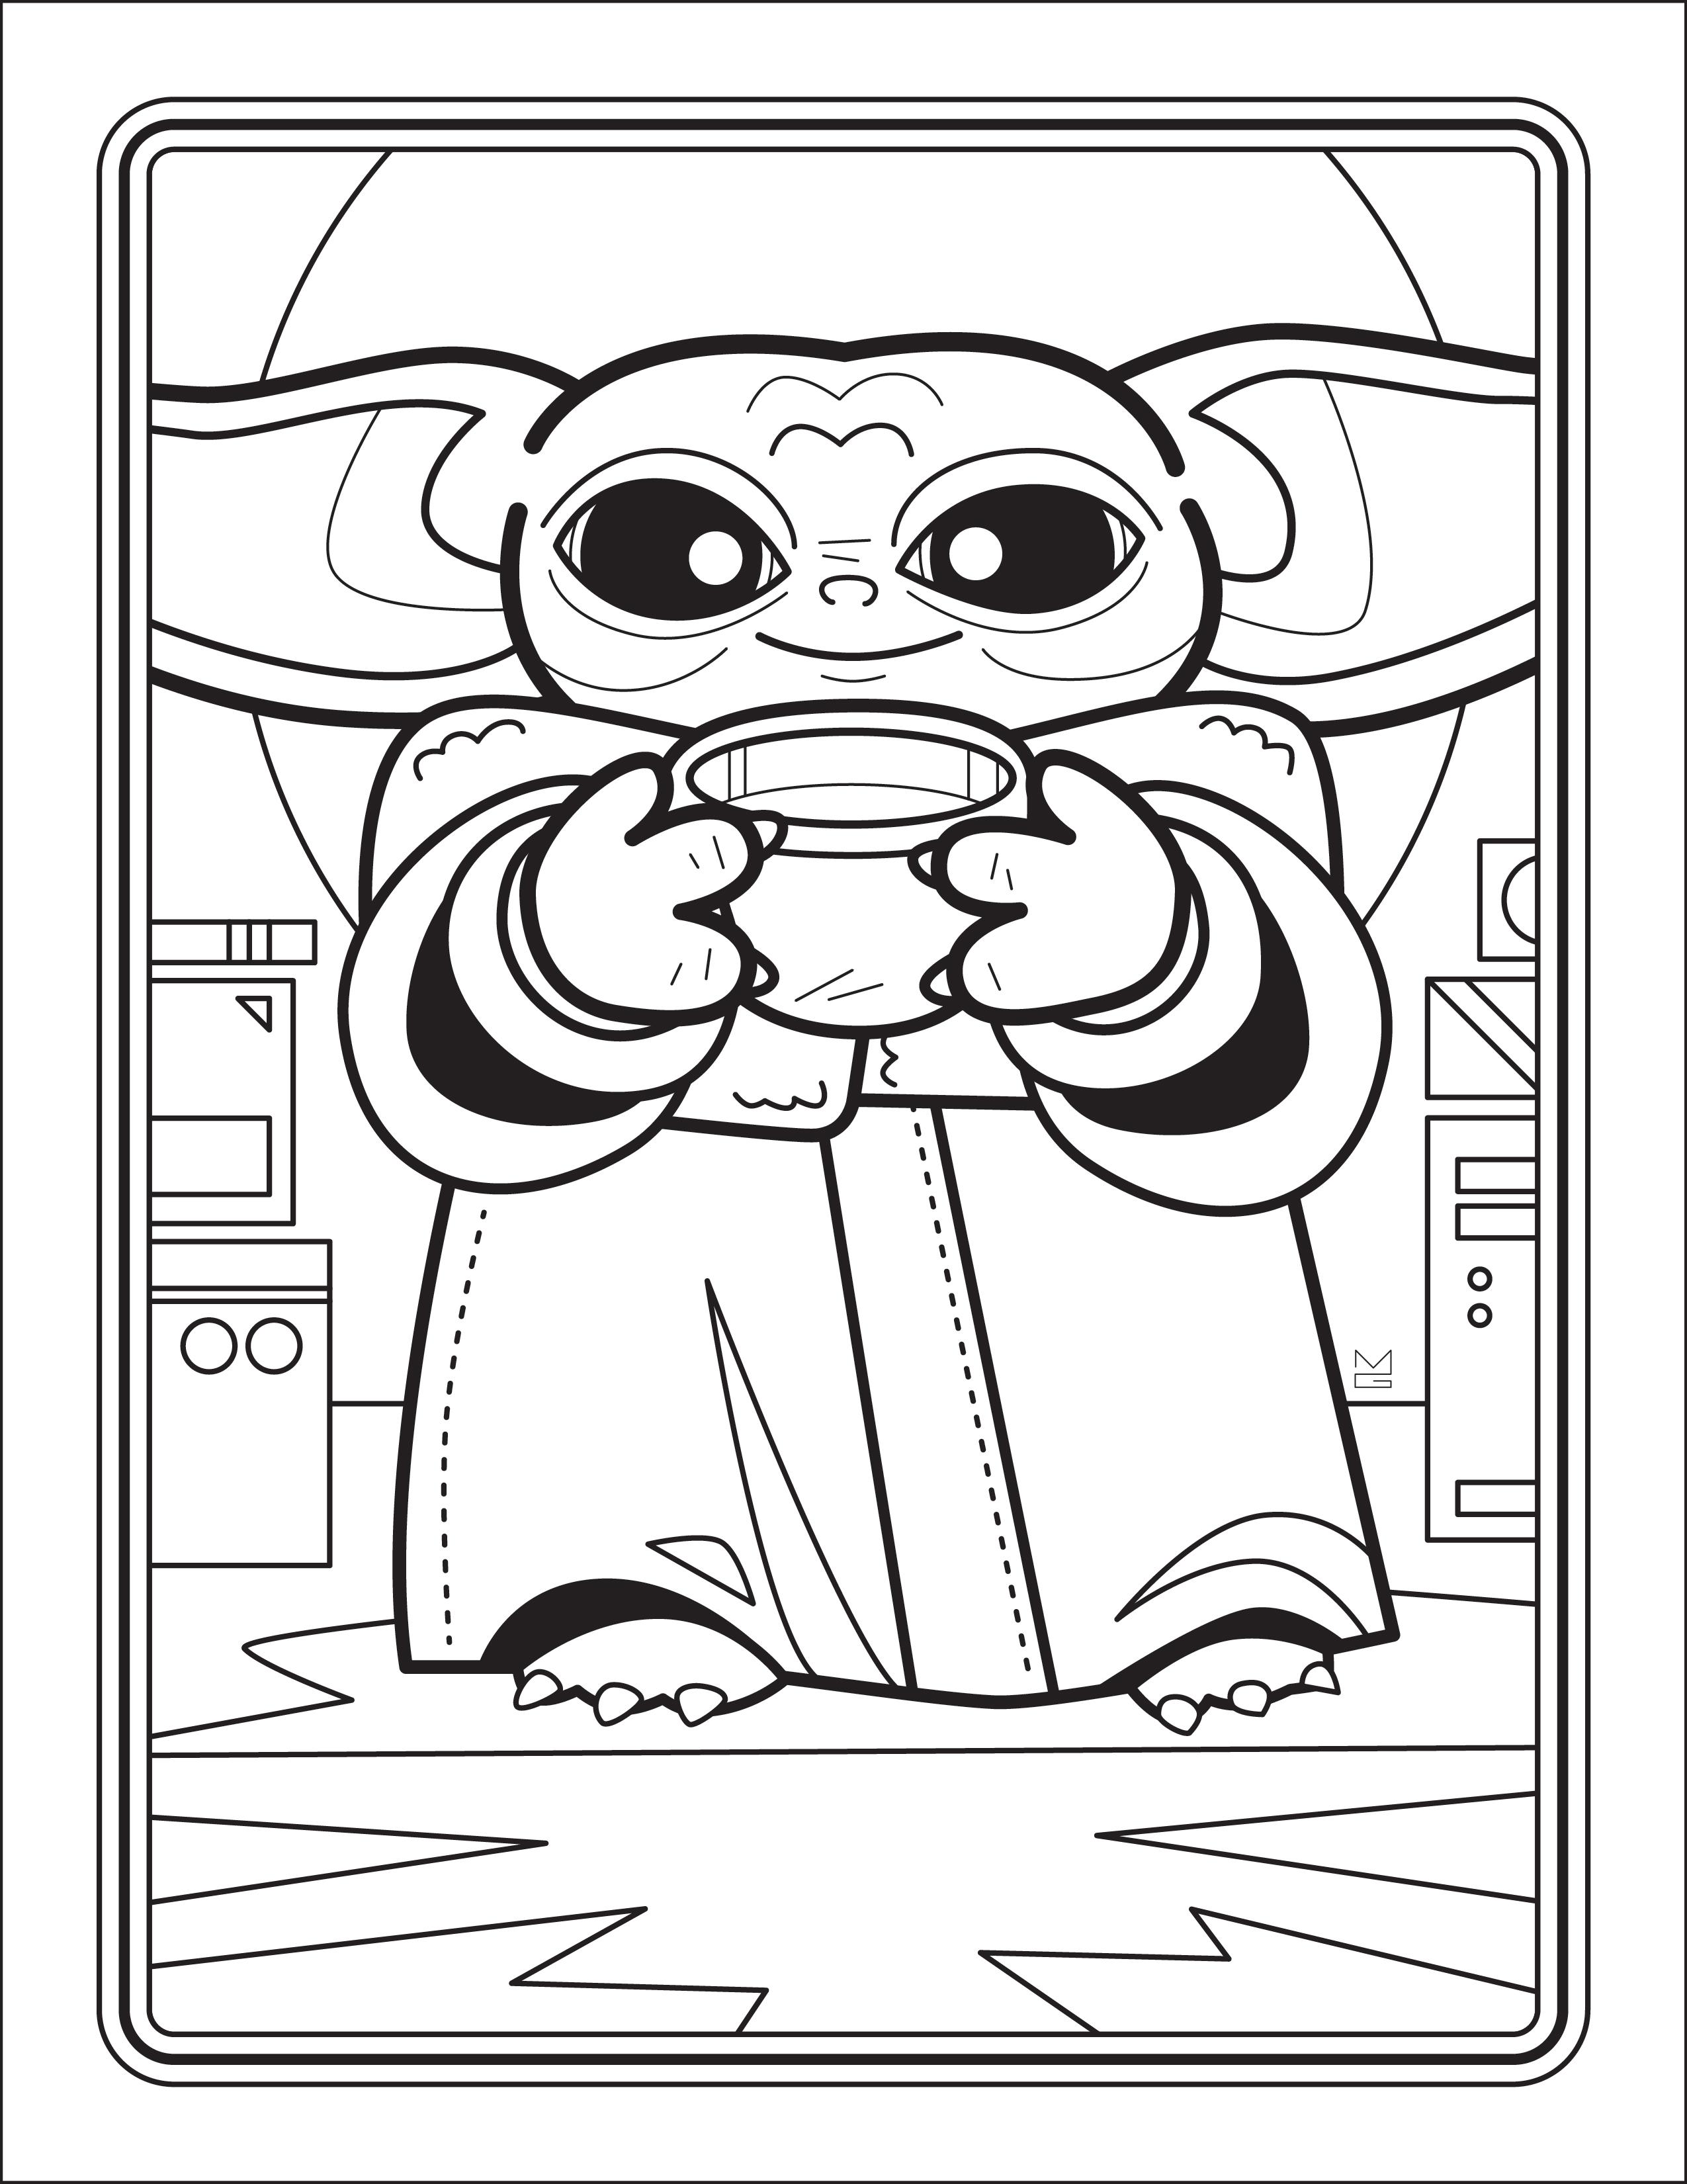 The Unofficial Baby Yoda Coloring Book